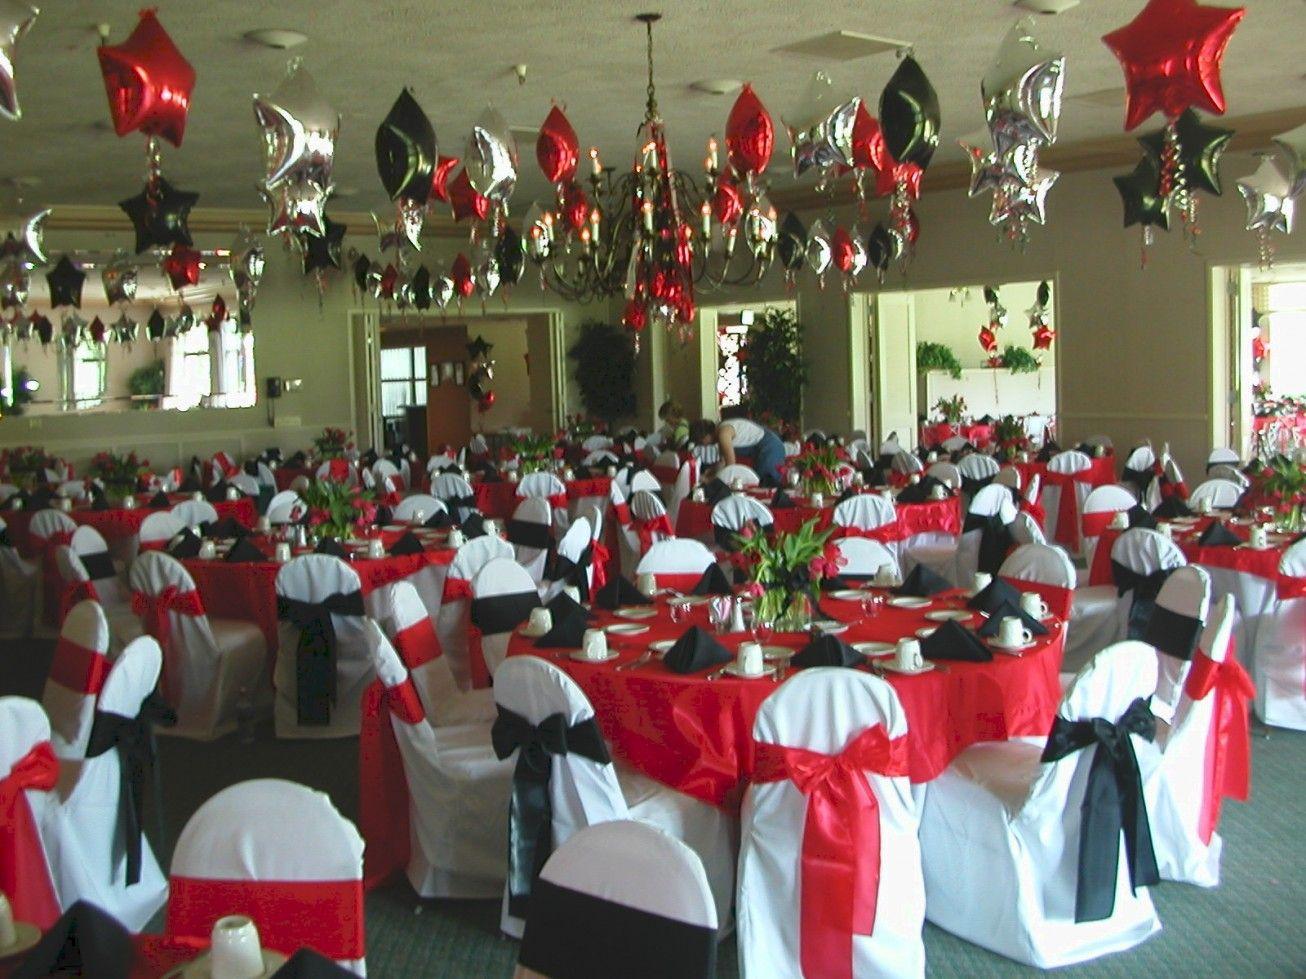 Superb College Christmas Party Ideas Part - 10: Graduation Centerpieces | With College Graduation Party Table Decorations :  Wonderful Graduation .